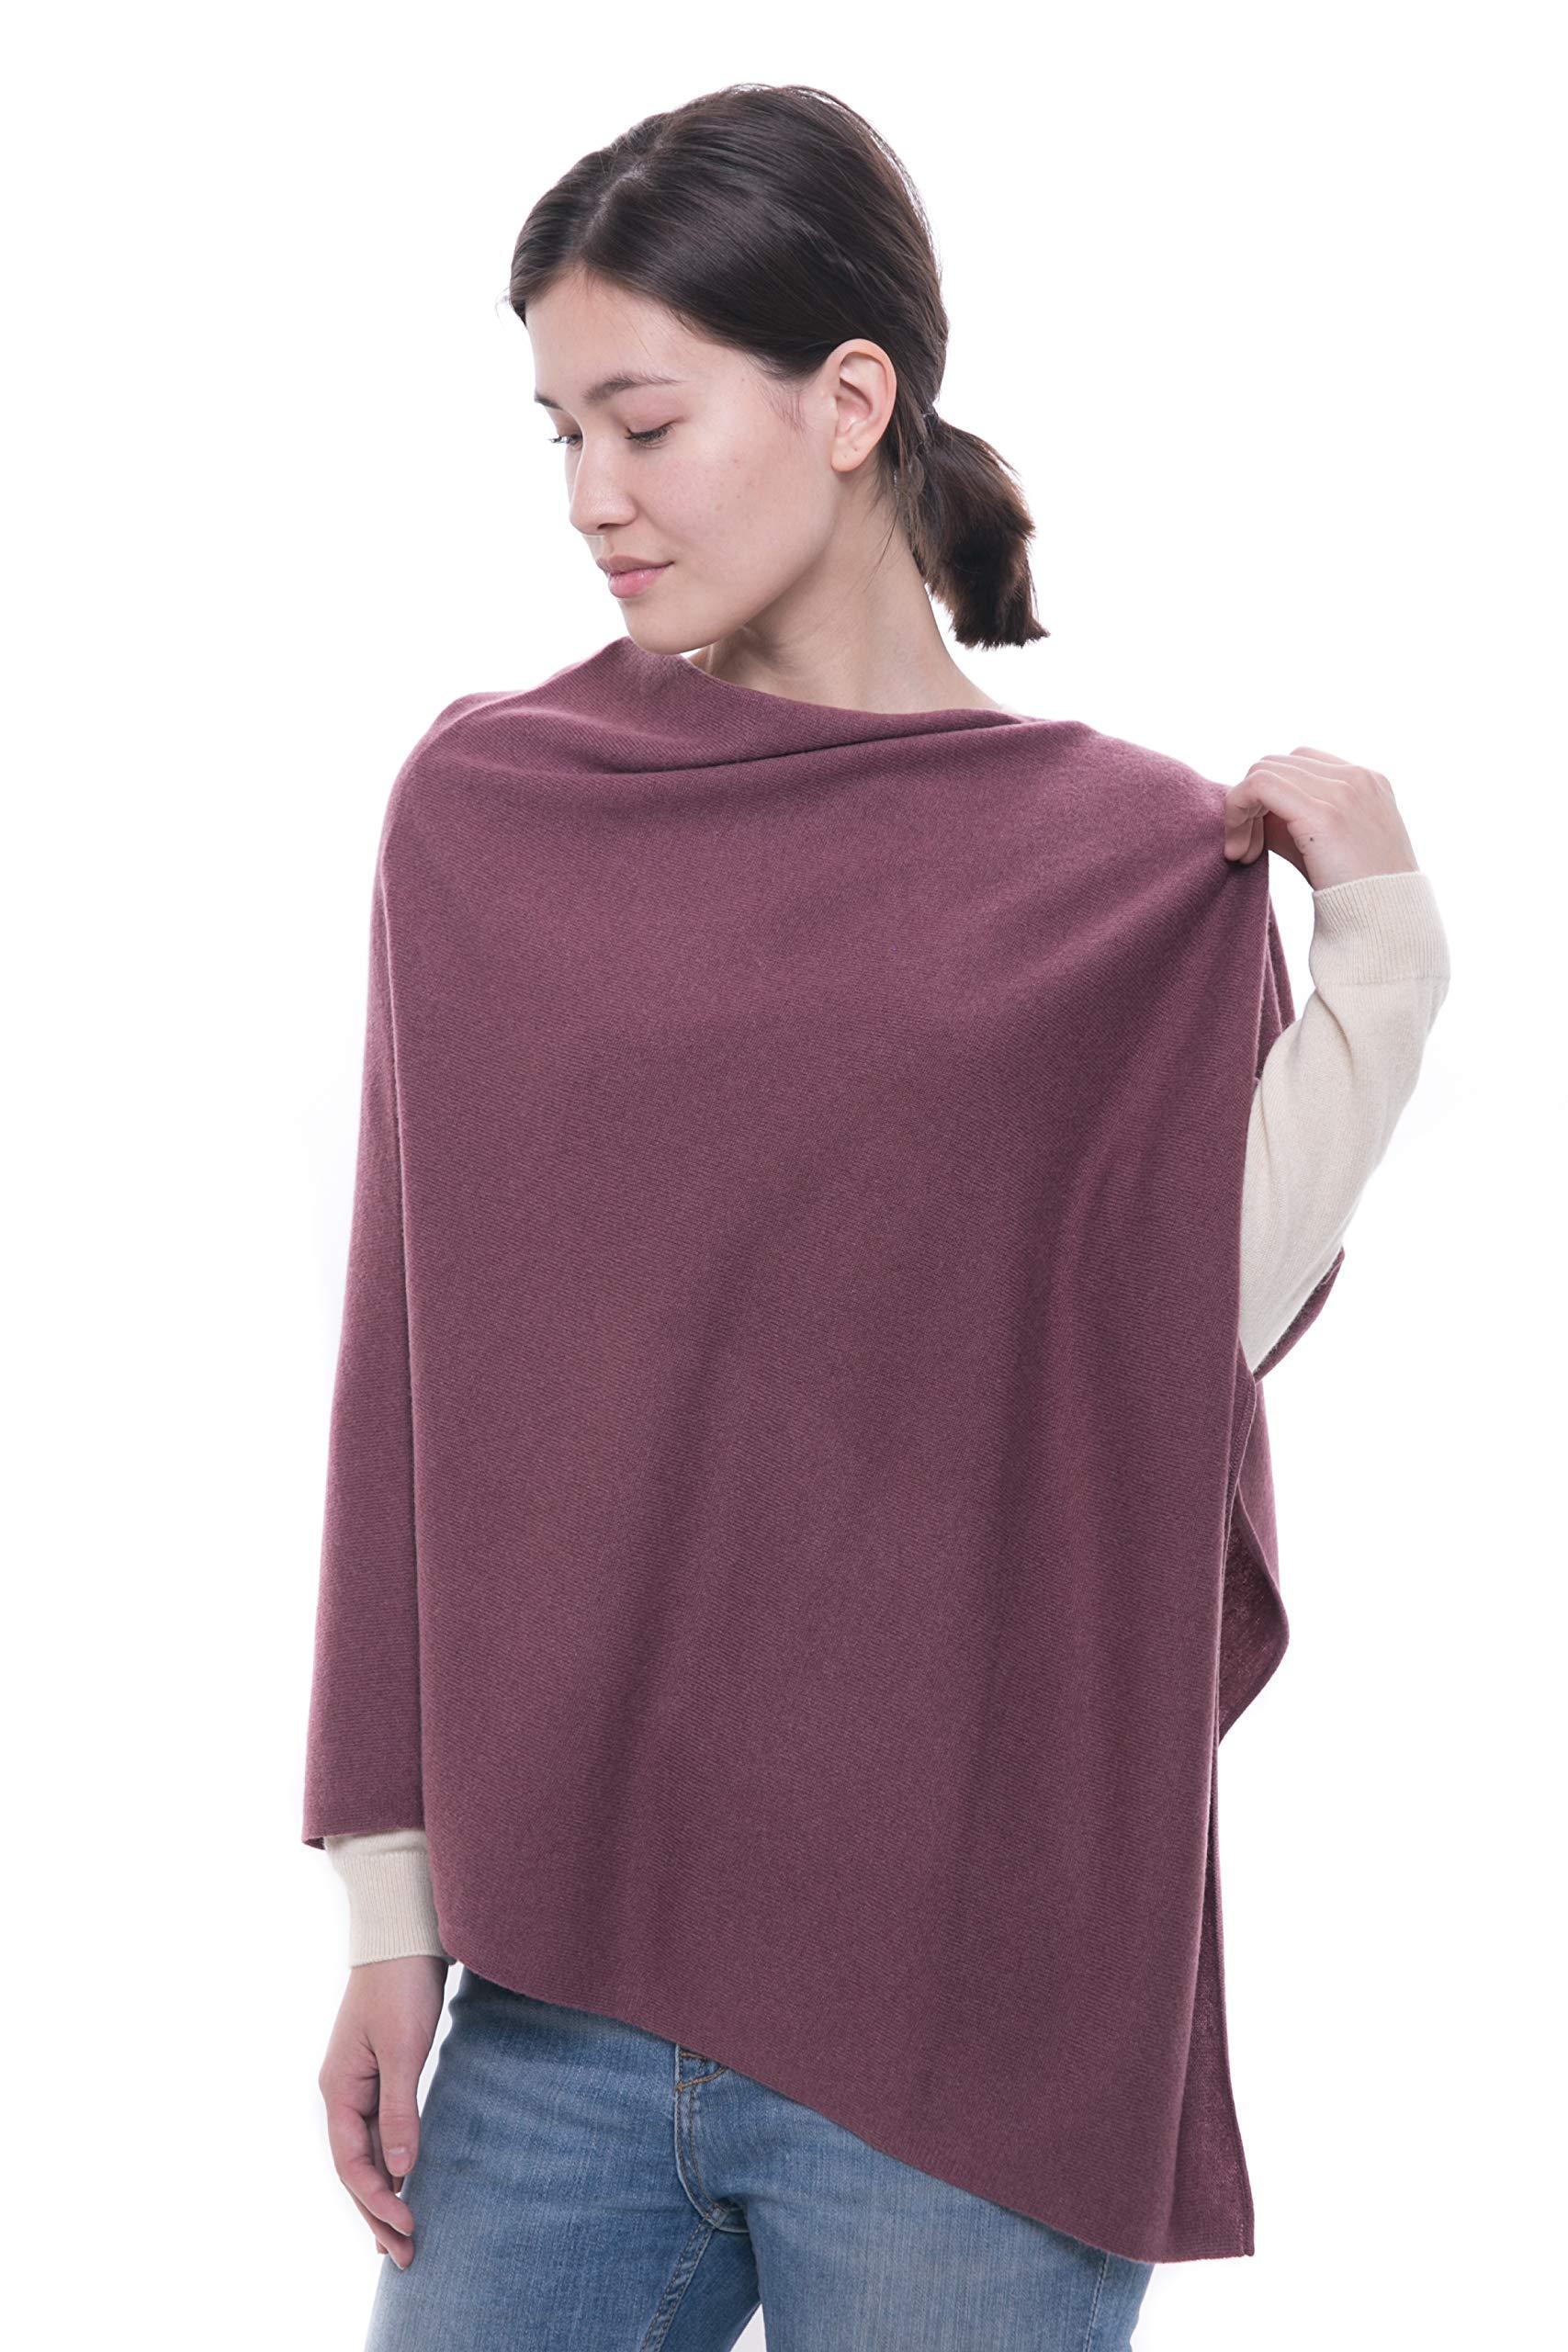 100% Pure Cashmere Poncho - Women's Draped Poncho, Cape and Dress Topper by Goyo Cashmere (English Lavender)